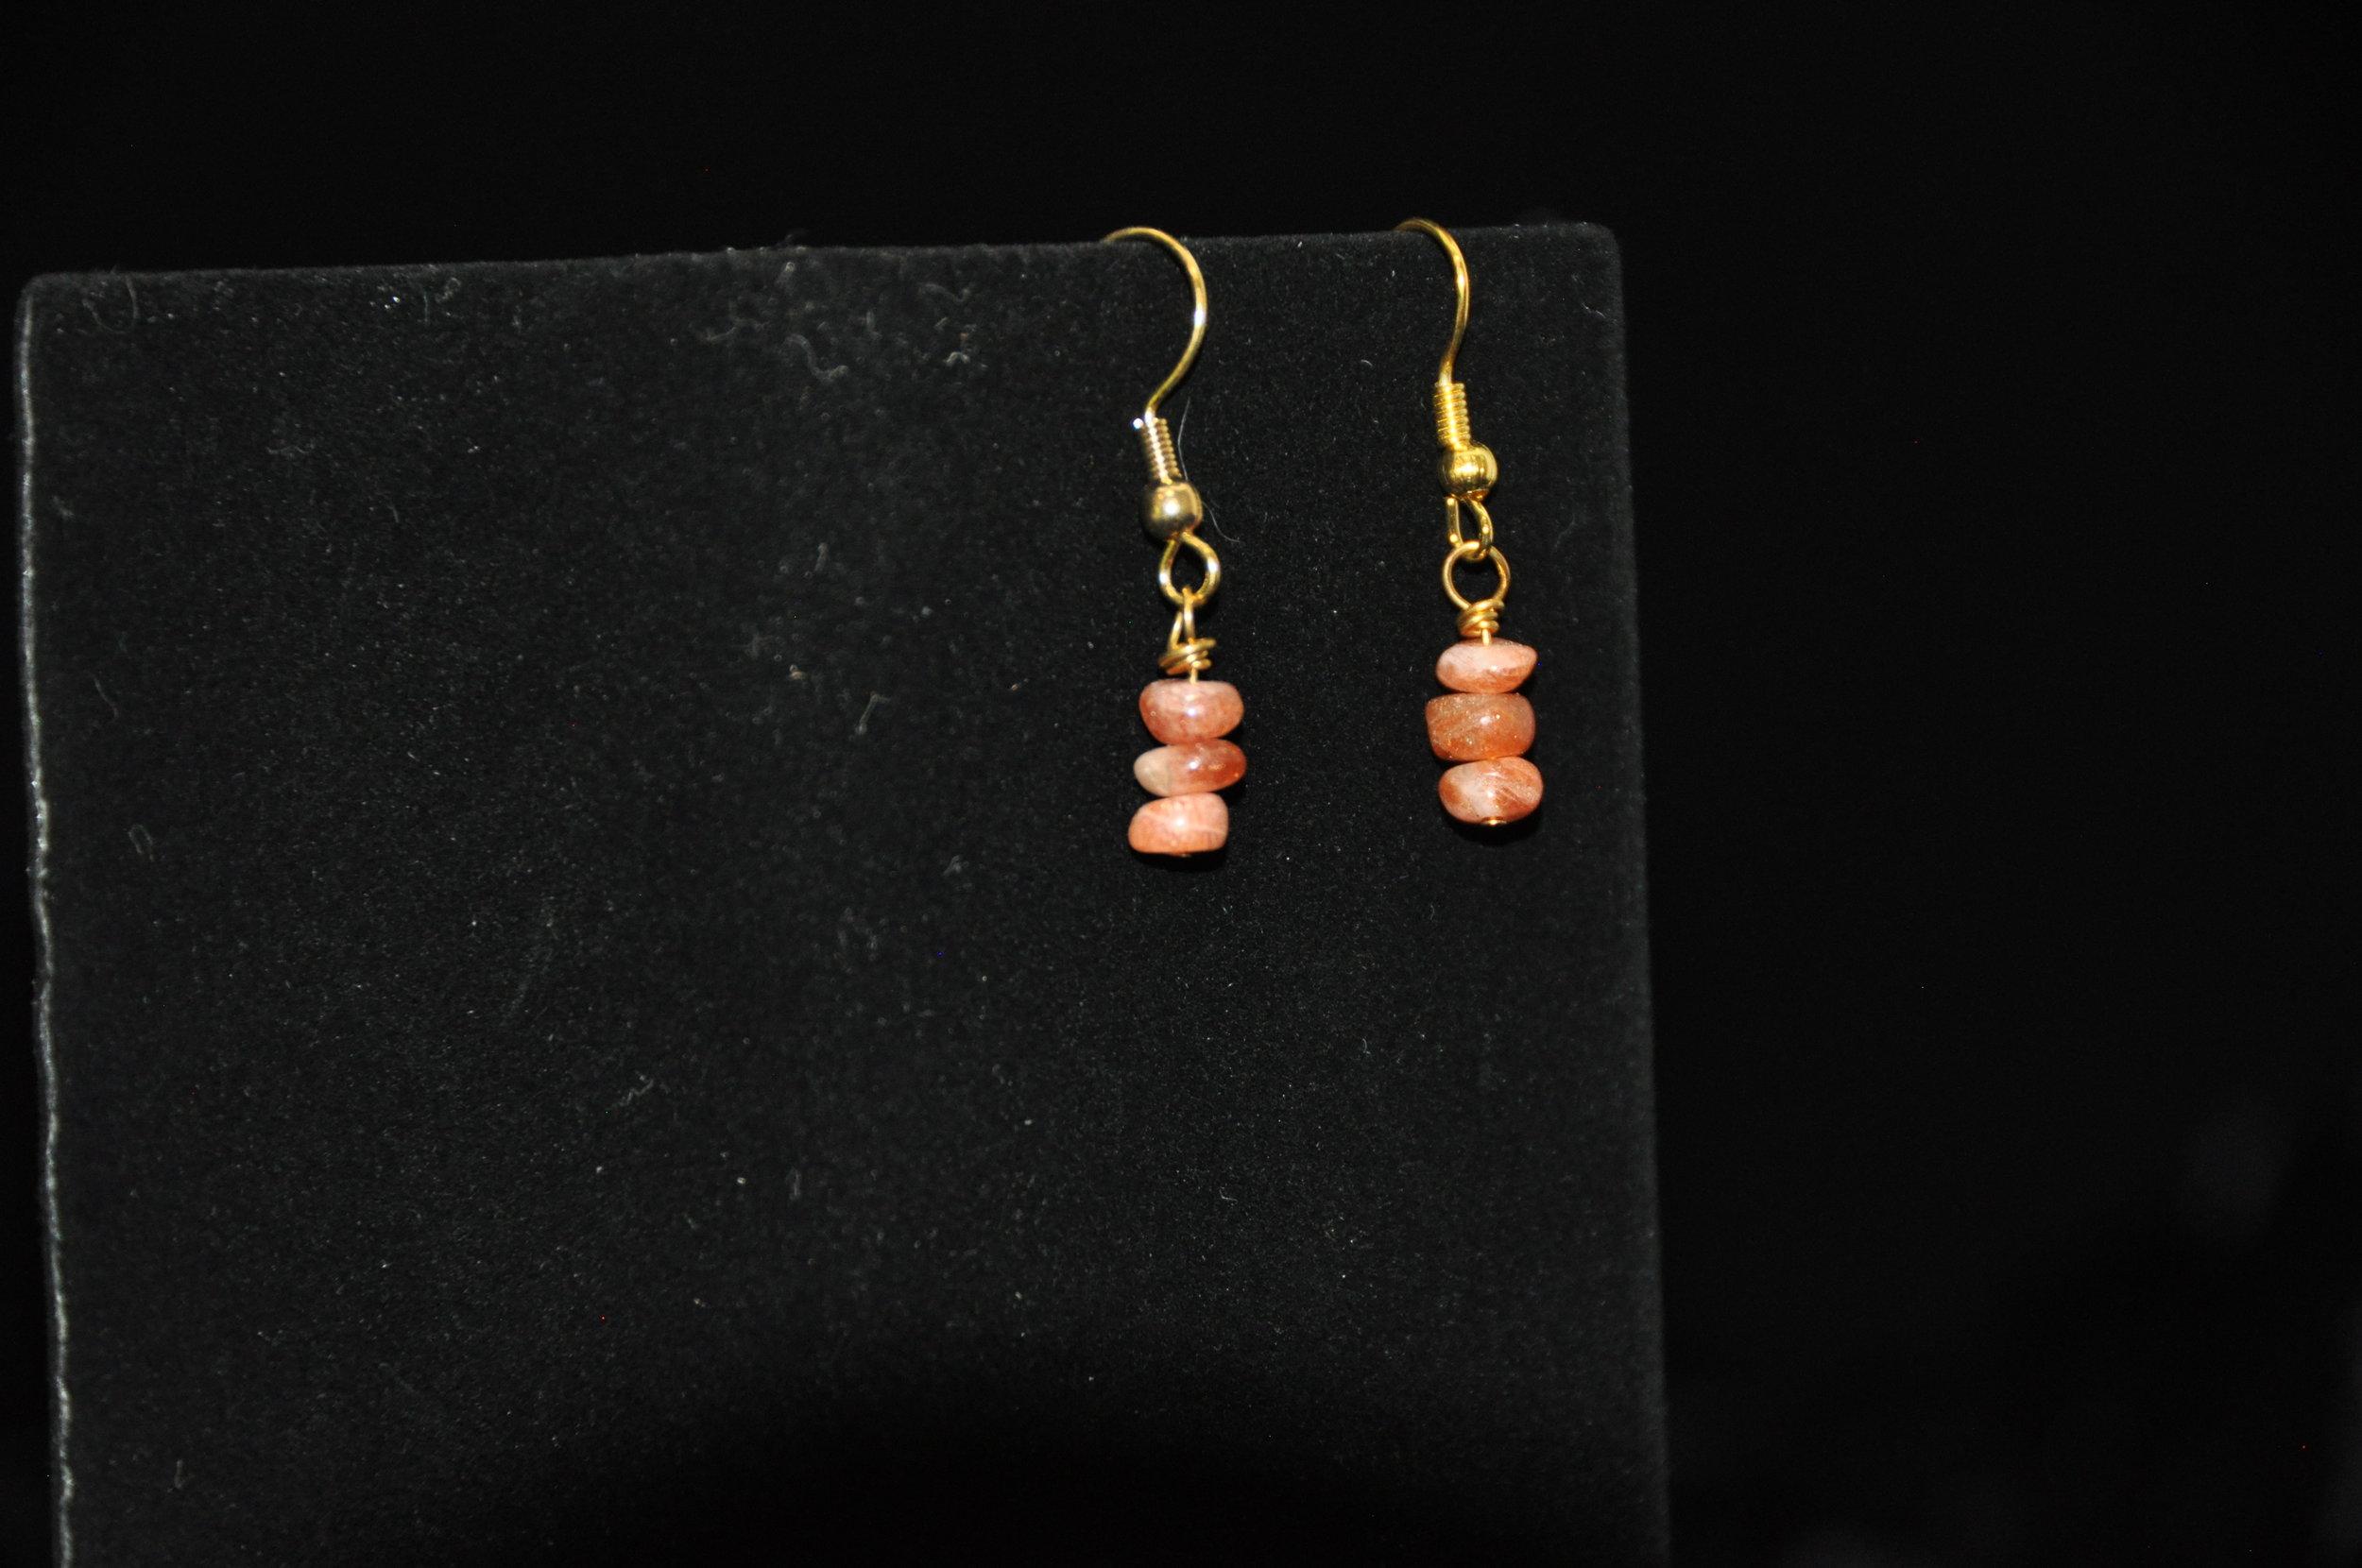 16 Ethiopian Opal & Sunstone Necklace and Earrings 5.JPG